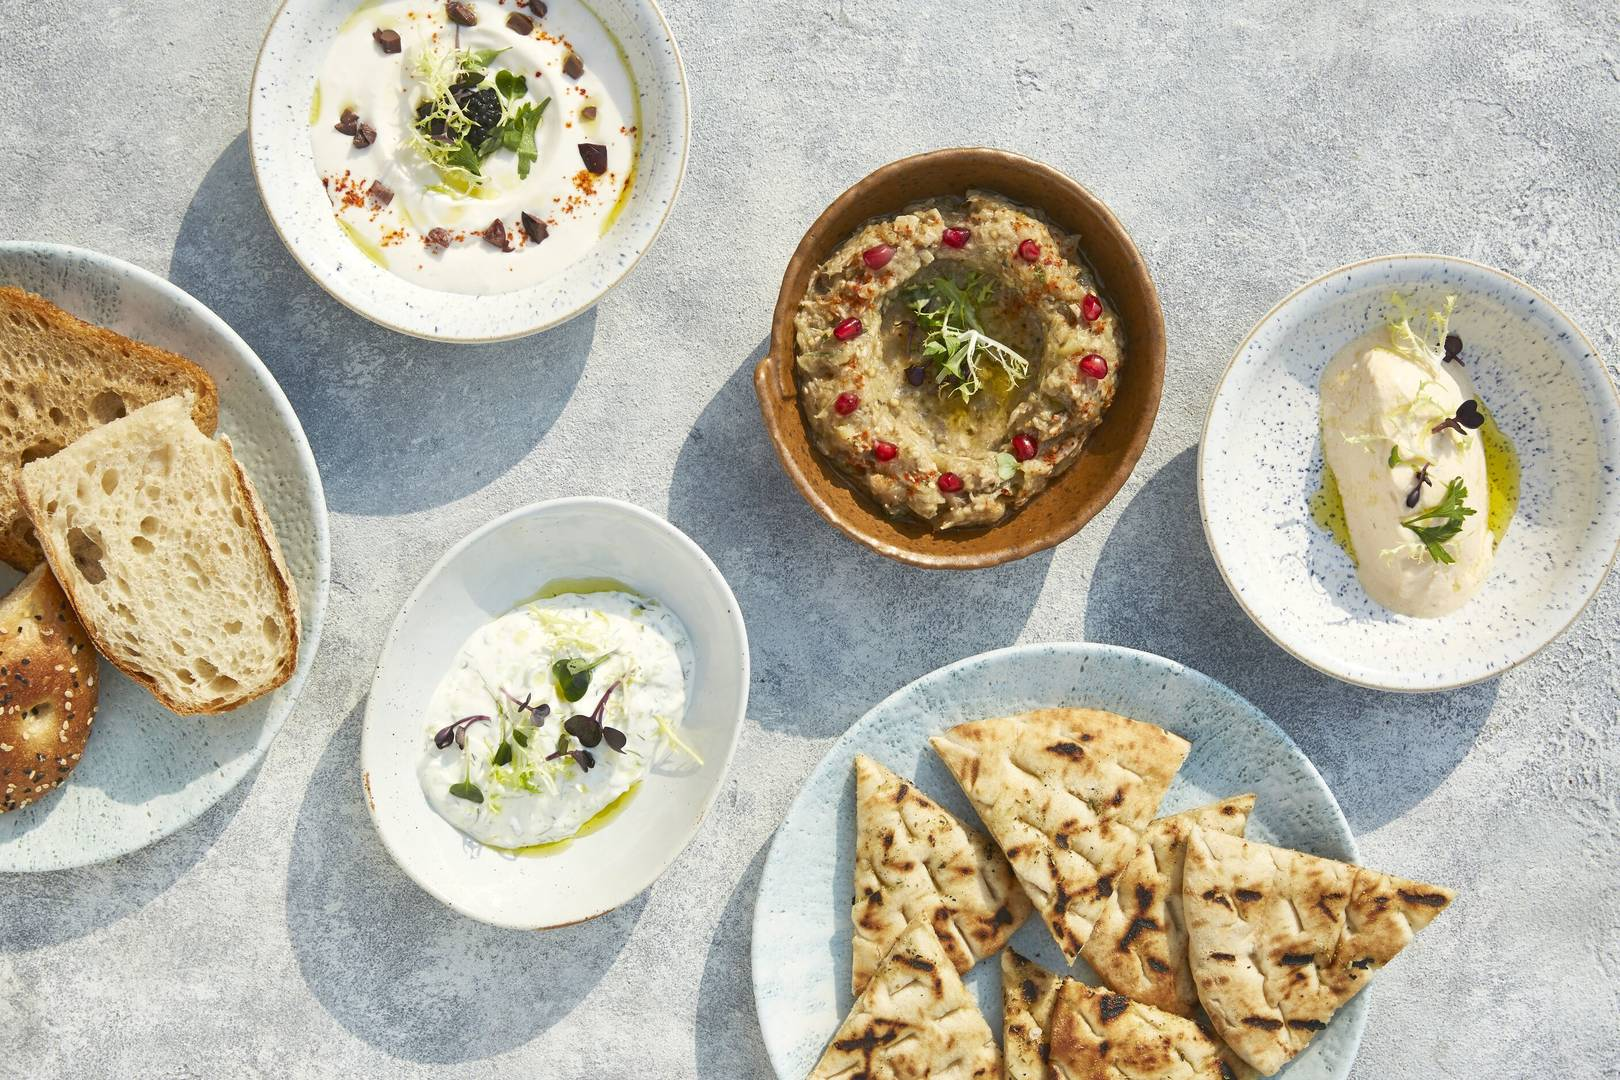 https://cdn.jumeirah.com/-/mediadh/DH/Hospitality/Jumeirah/Restaurants/Dubai/Mina-A-Salam-Shimmers/Restaurant-Gallery/Jumeirah-Mina-ASalam--Shimmers--Sharing-DipsLandscape.jpg?h=1080&w=1620&hash=C0F937B66291A1BA38FD604920A441F2